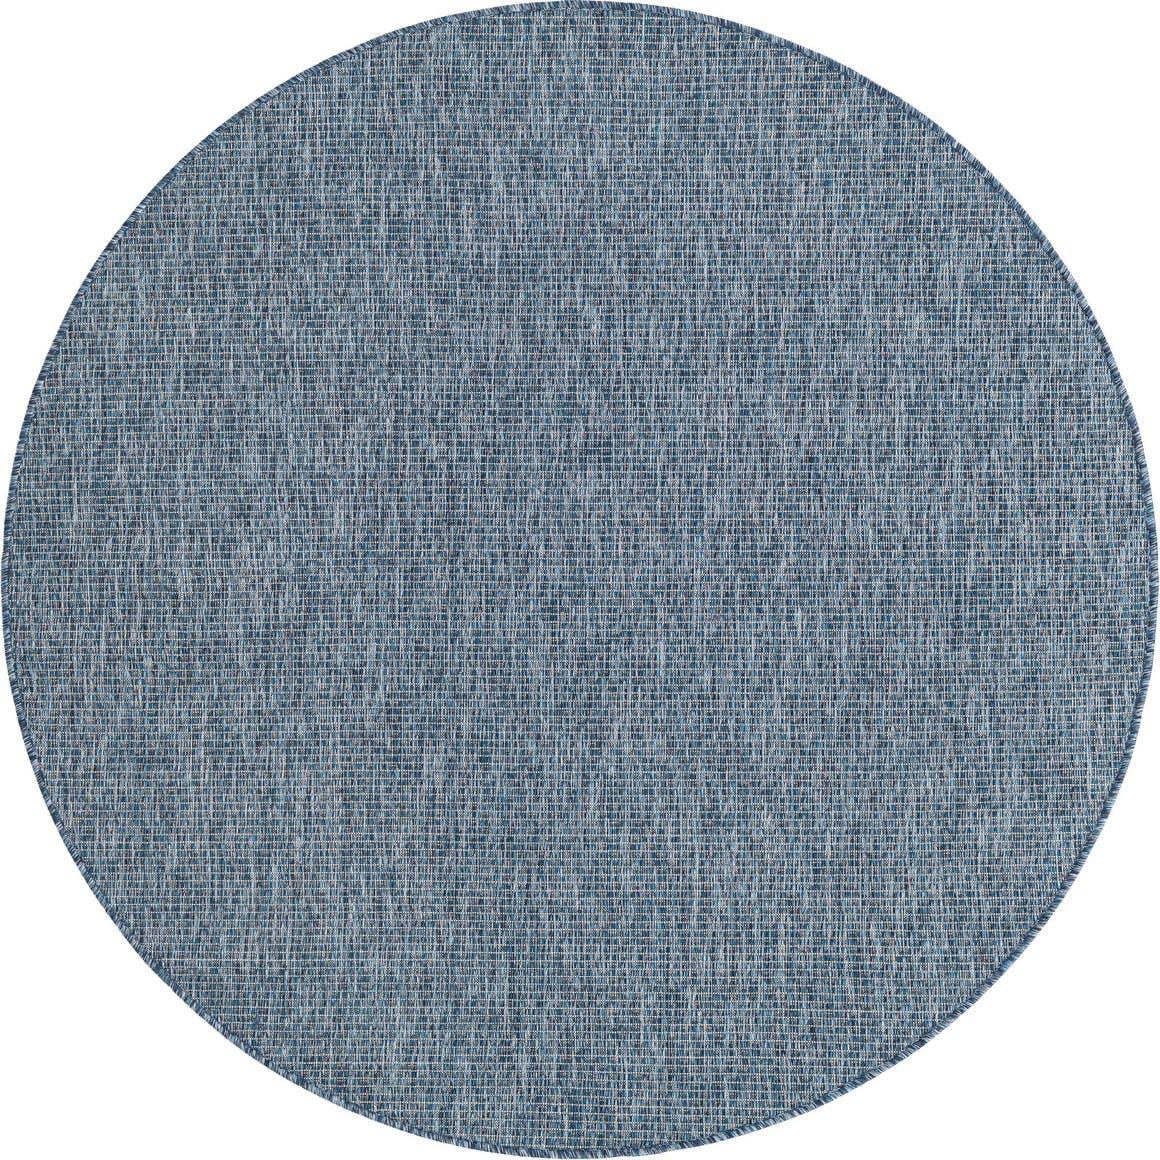 5' x 5' Outdoor Basic Round Rug main image